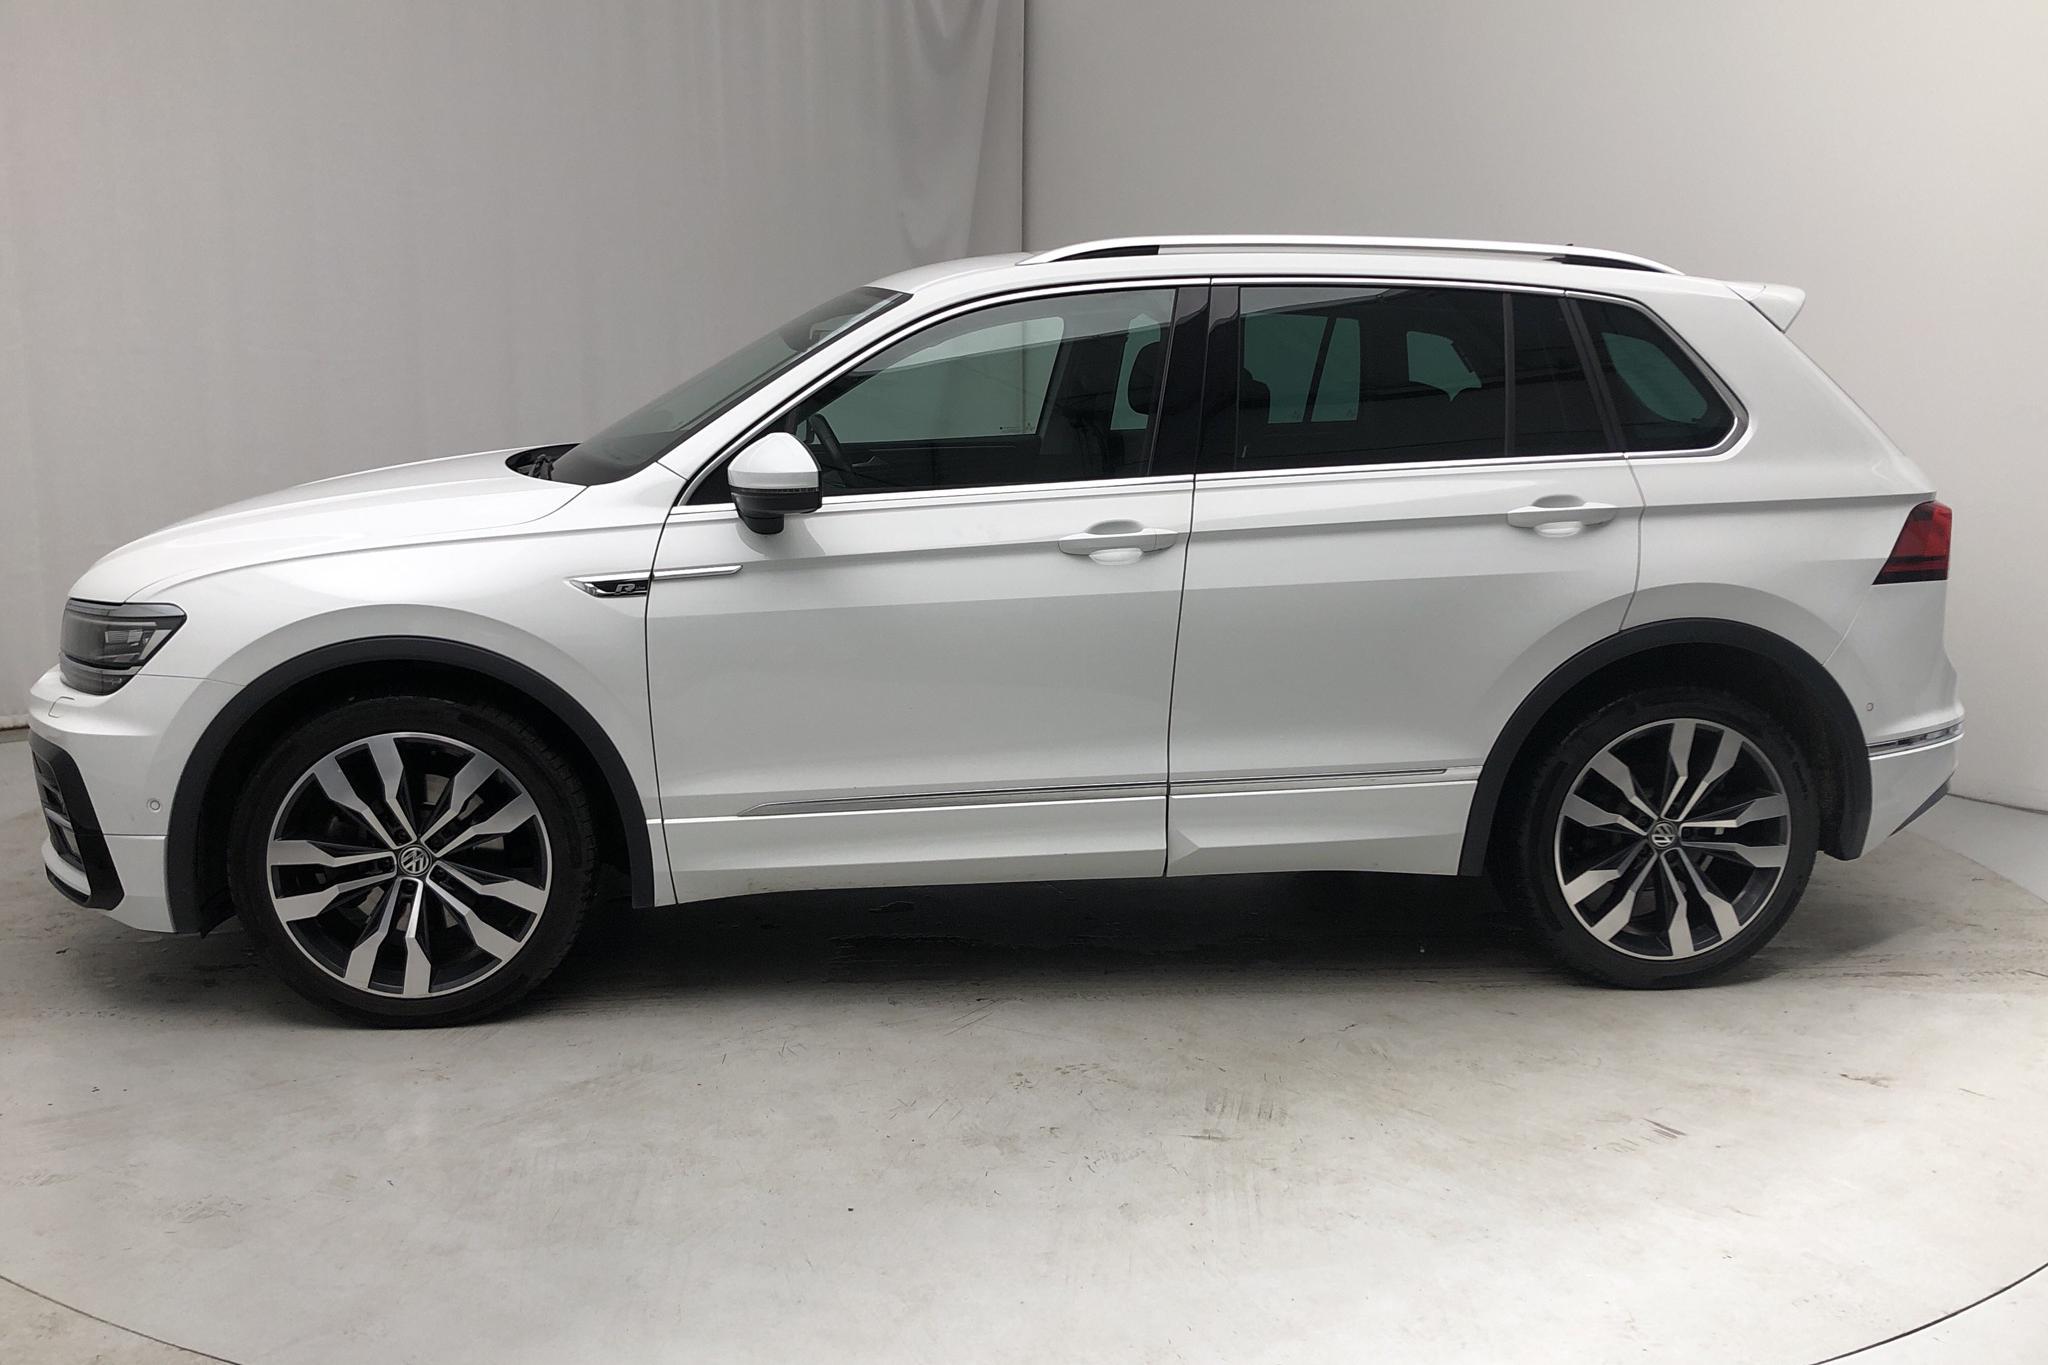 VW Tiguan 2.0 TDI 4MOTION (190hk) - 6 971 mil - Automat - vit - 2018